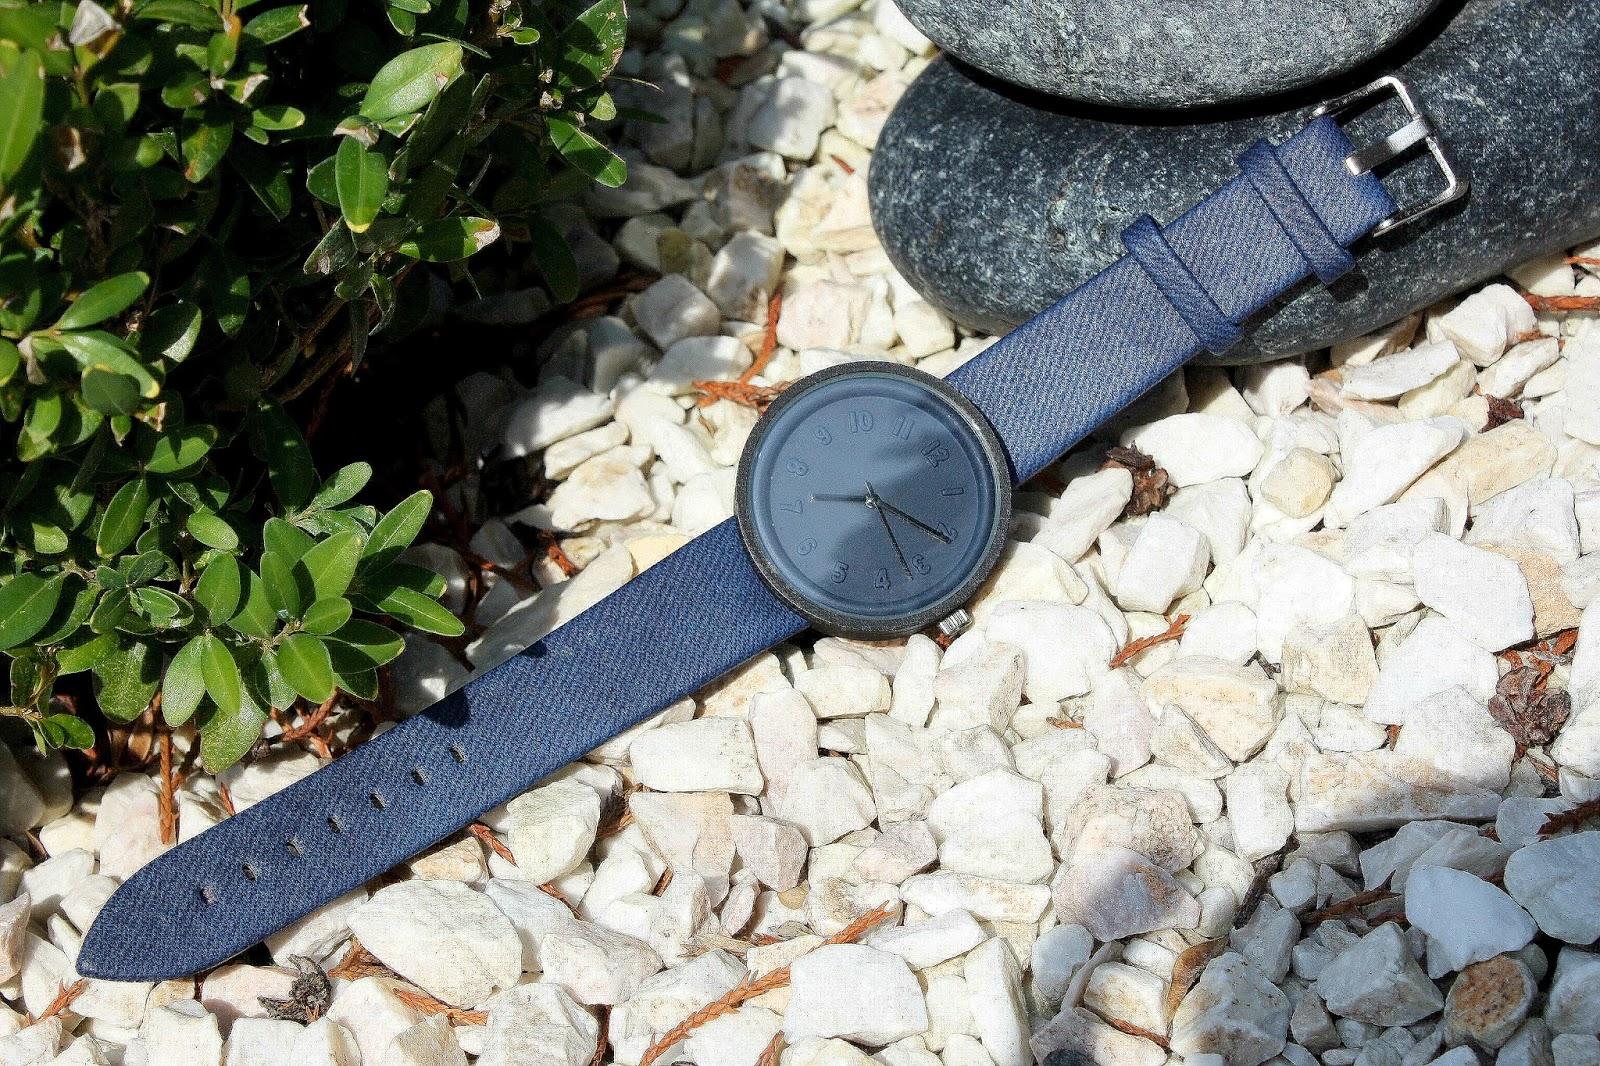 http://www.dresslily.com/miler-a8289-male-quartz-watch-product1193424.html?lkid=1505435